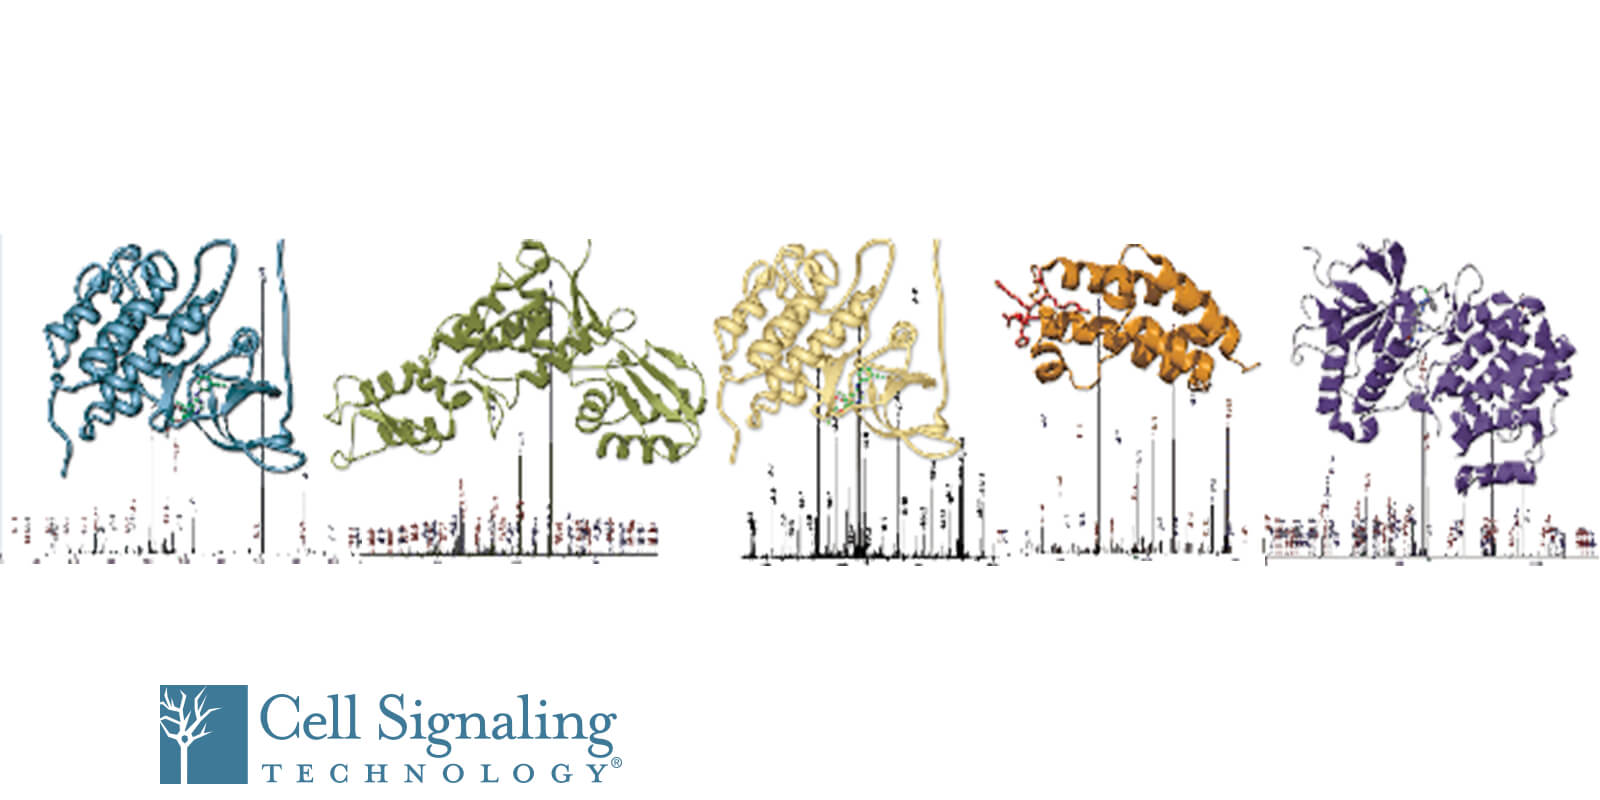 Webinar: Post Translational Modifications: Antibody Enrichment for Mass Spectrometry-based Proteomics